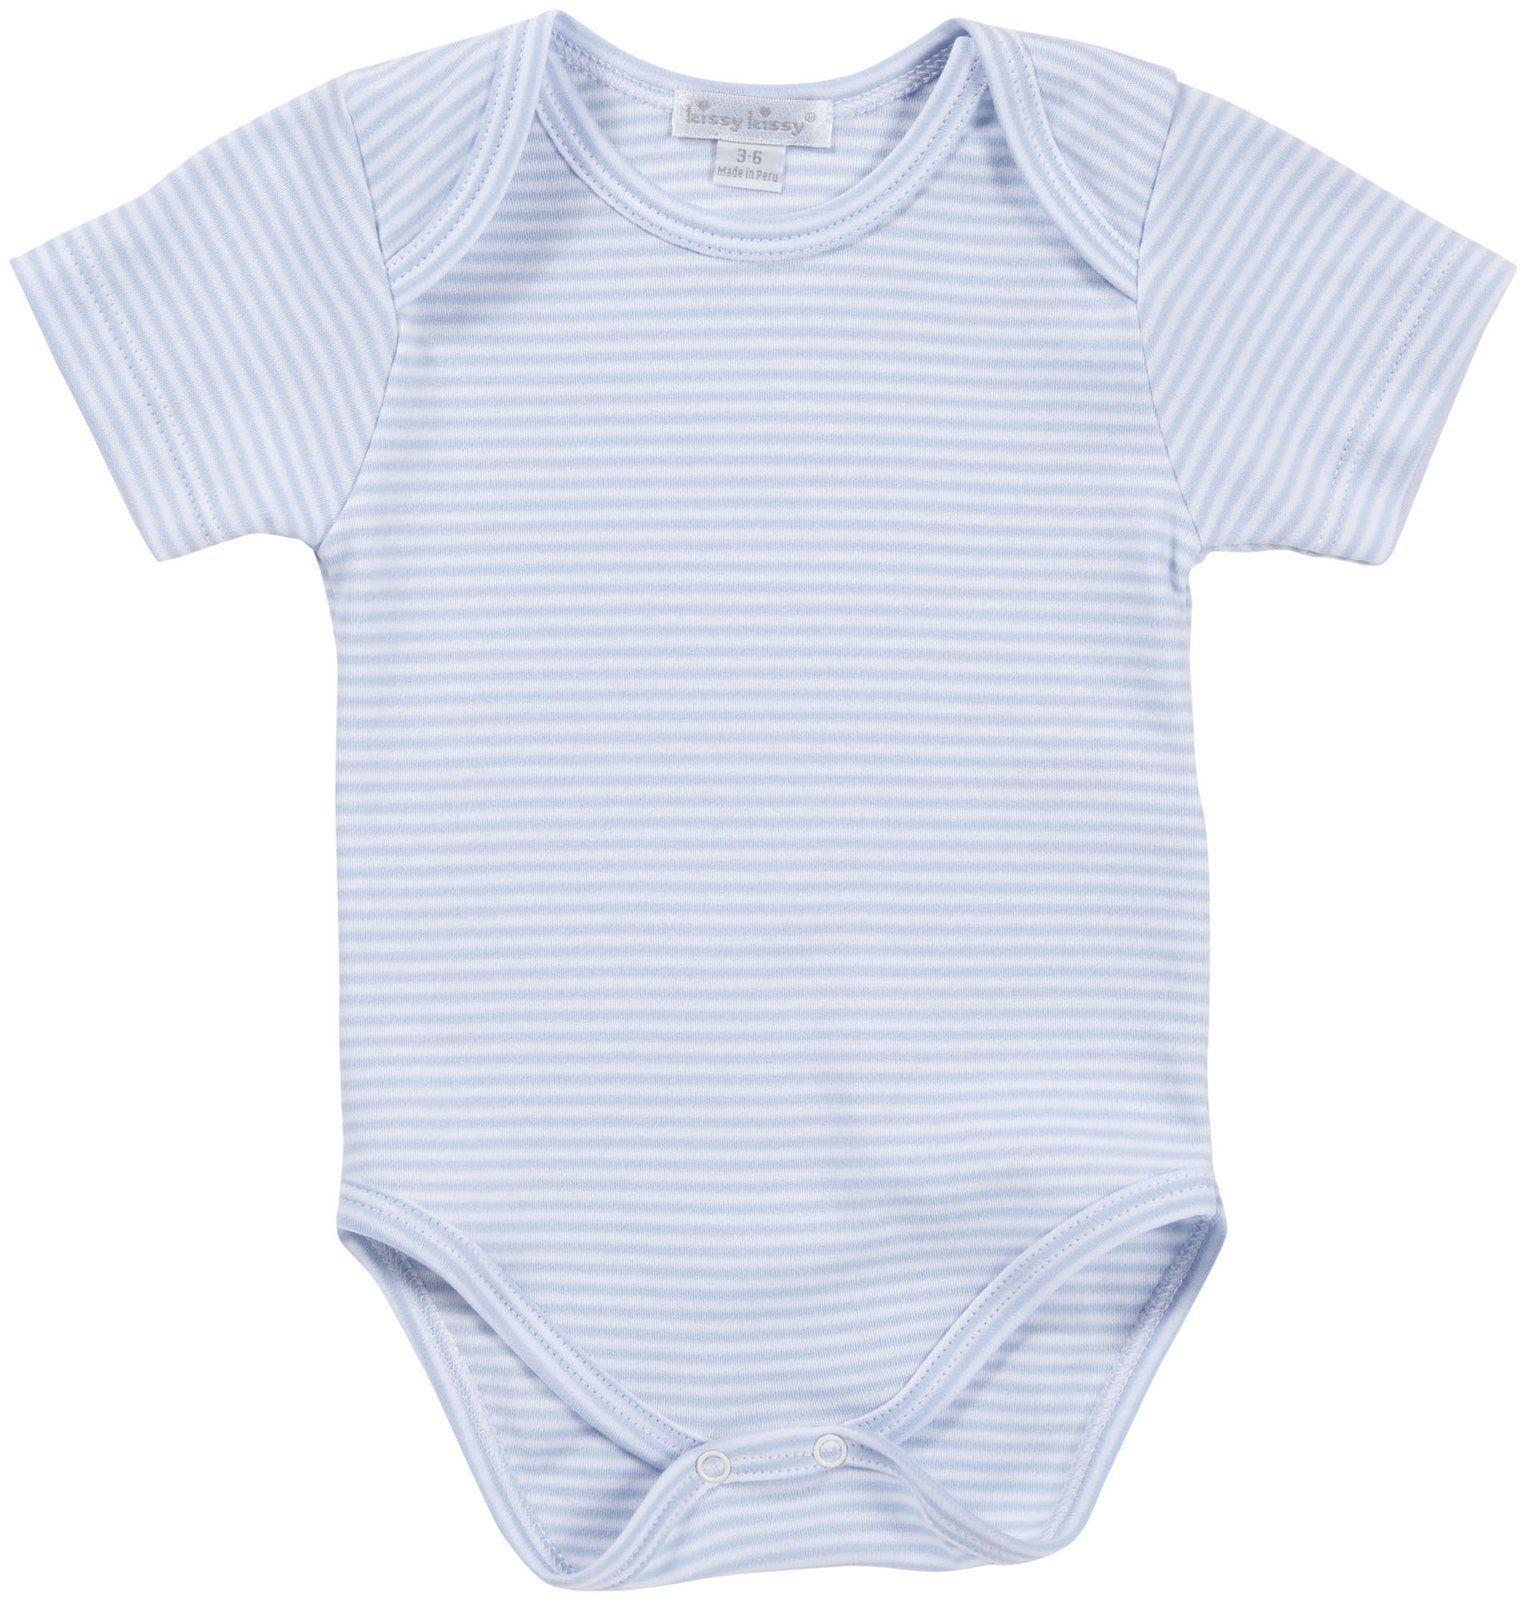 7186a4719 Kissy Kissy Baby Boys' S/S Stripe Bodysuit -Blue - 3-6 Months ...